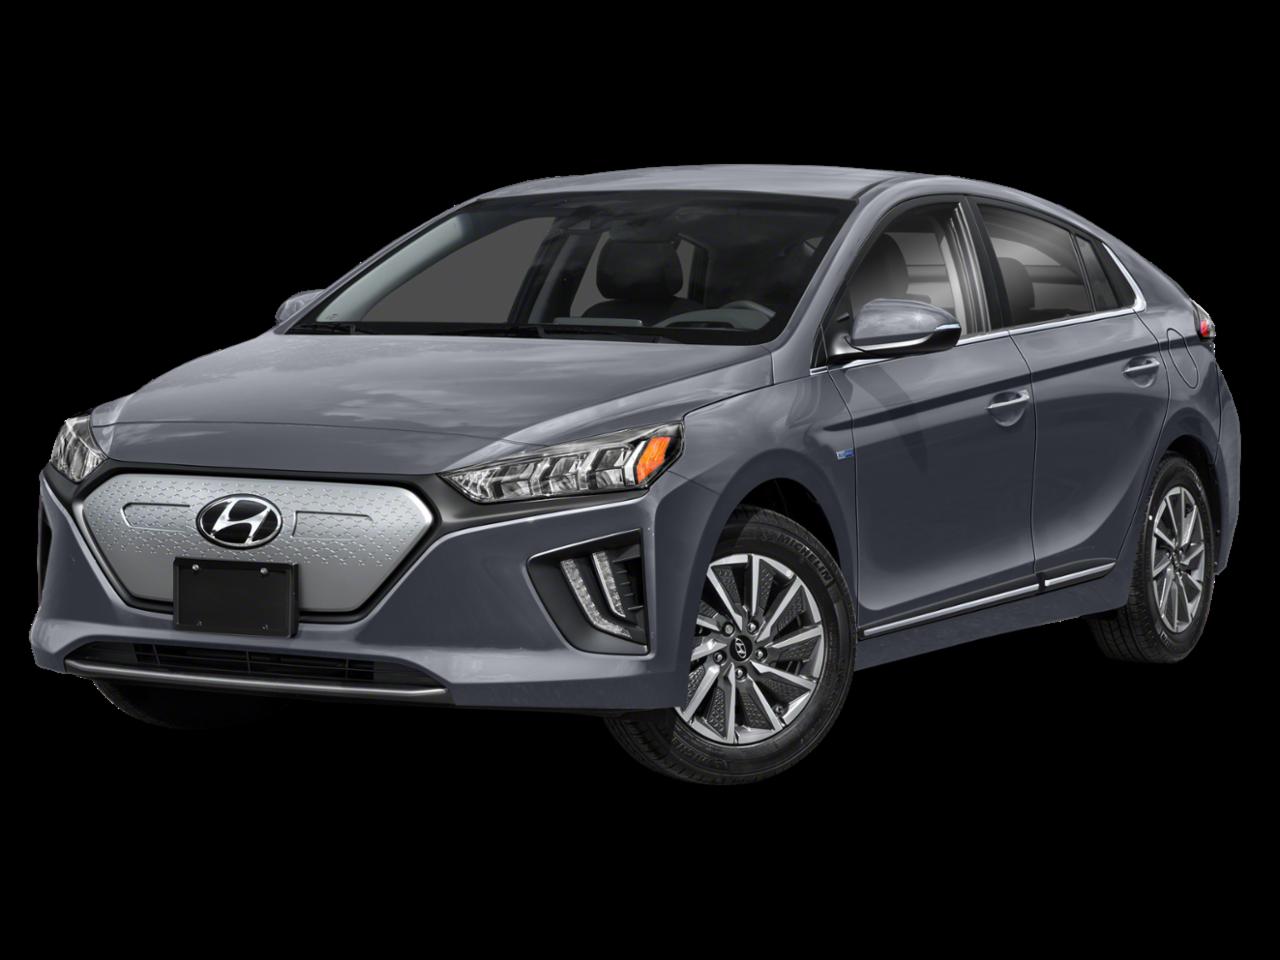 Hyundai 2021 IONIQ Electric Limited